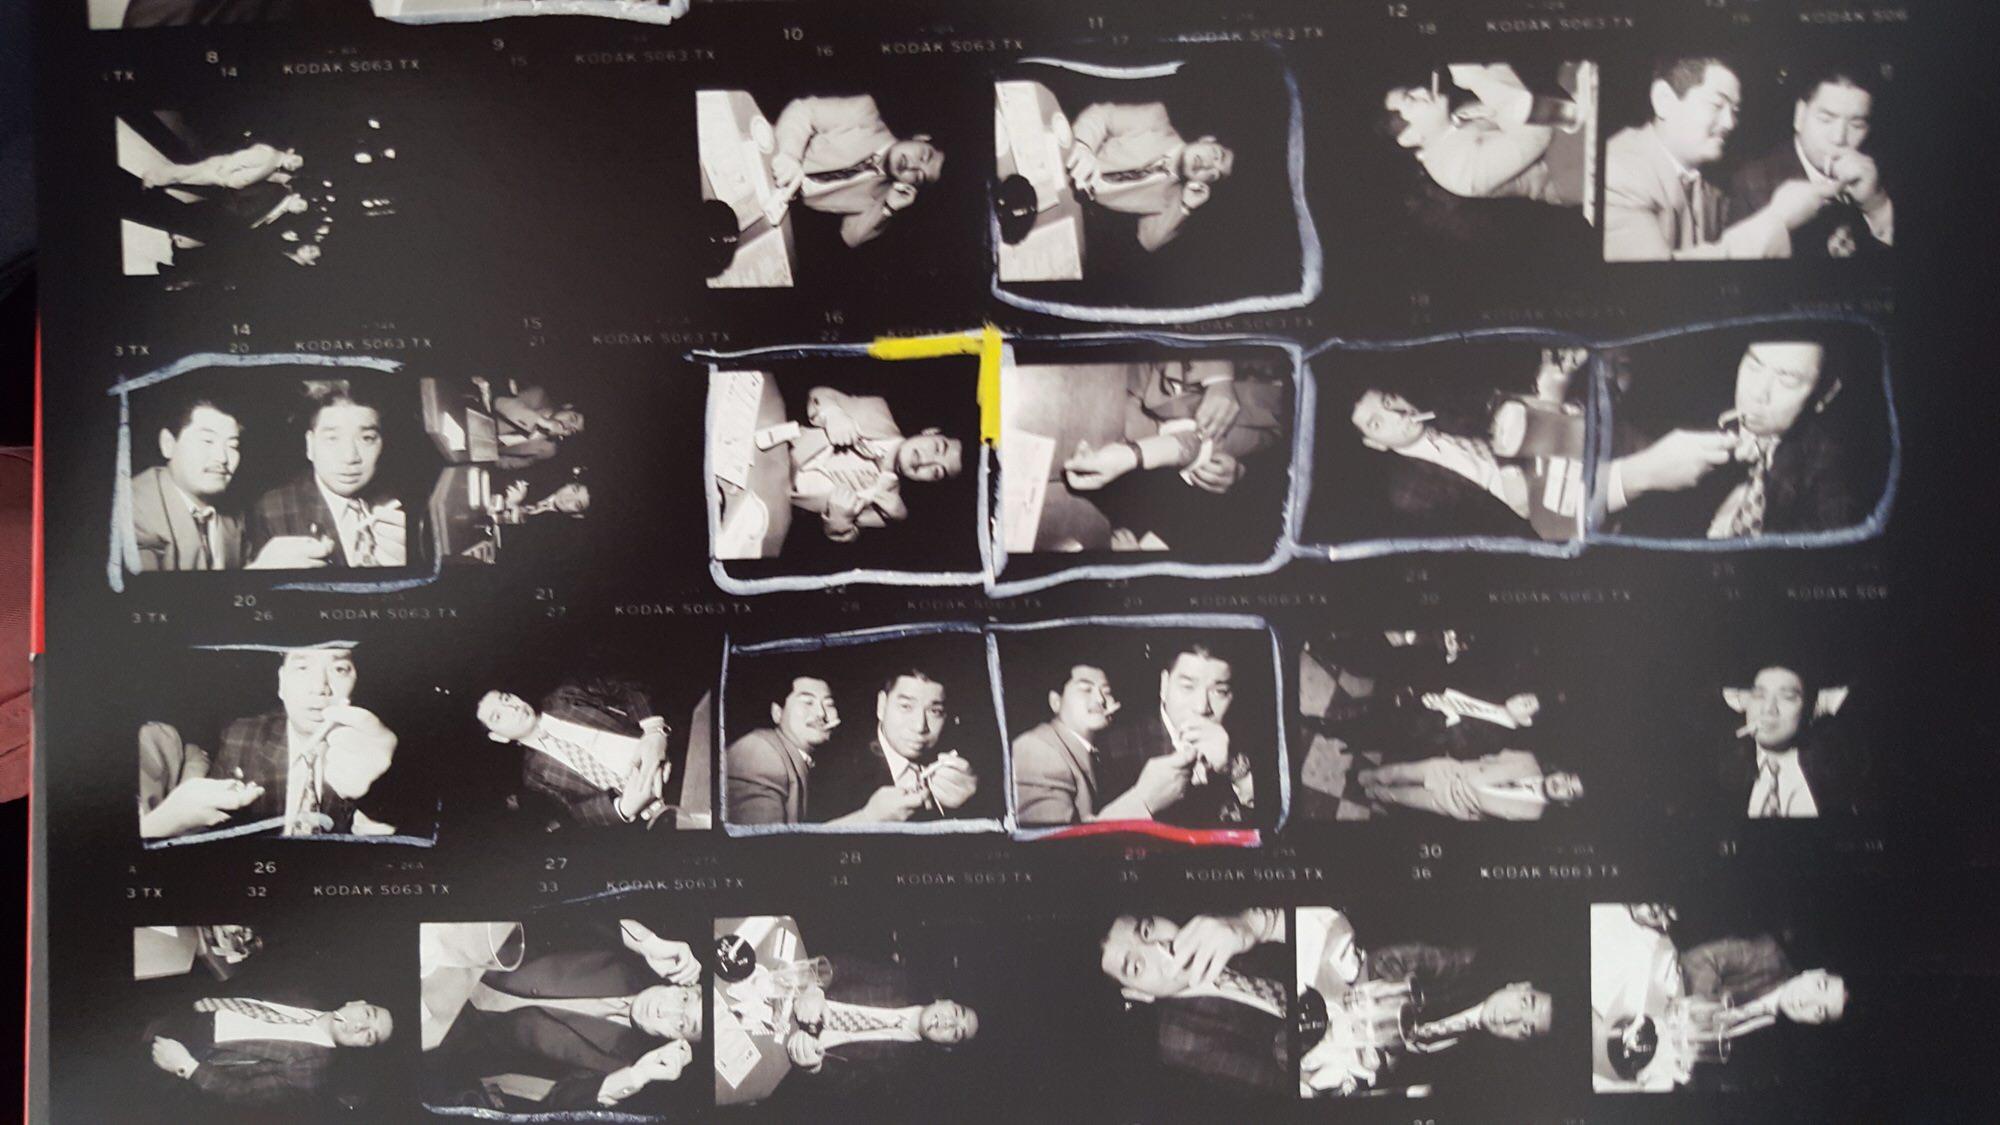 bruce gilden - yakuza cigarette contact sheet2